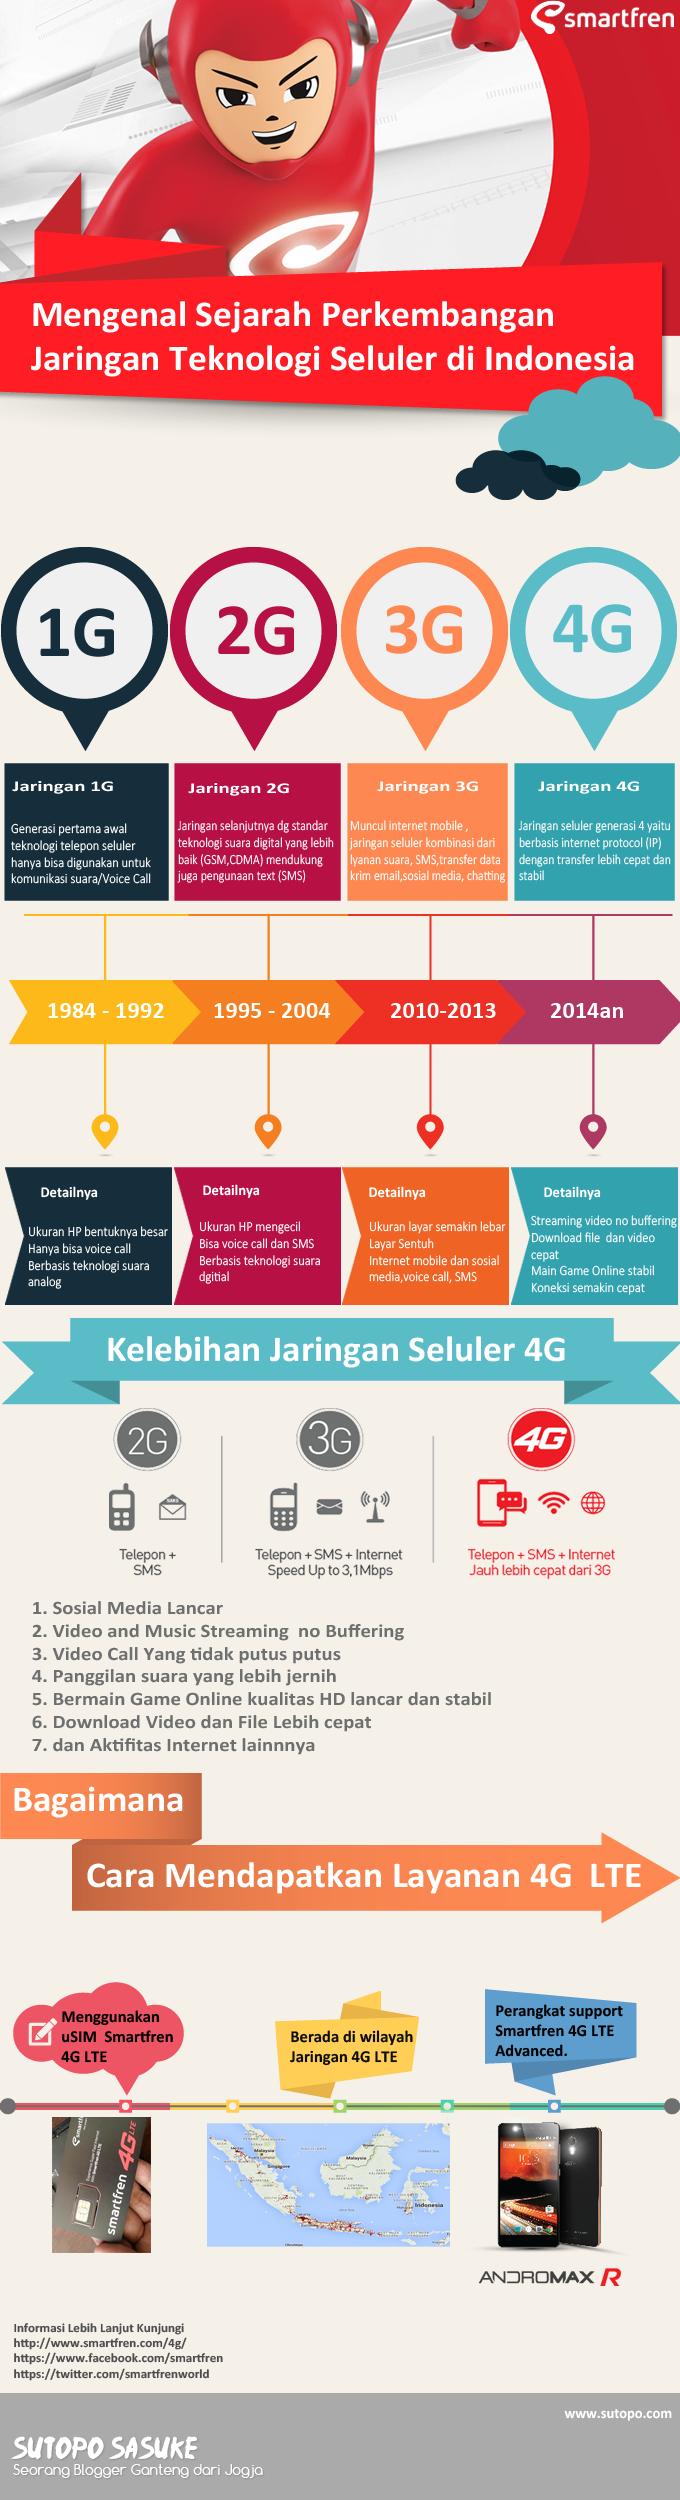 Sejarah Perkembangan Teknologi Komunikasi Seluler diIndonesia